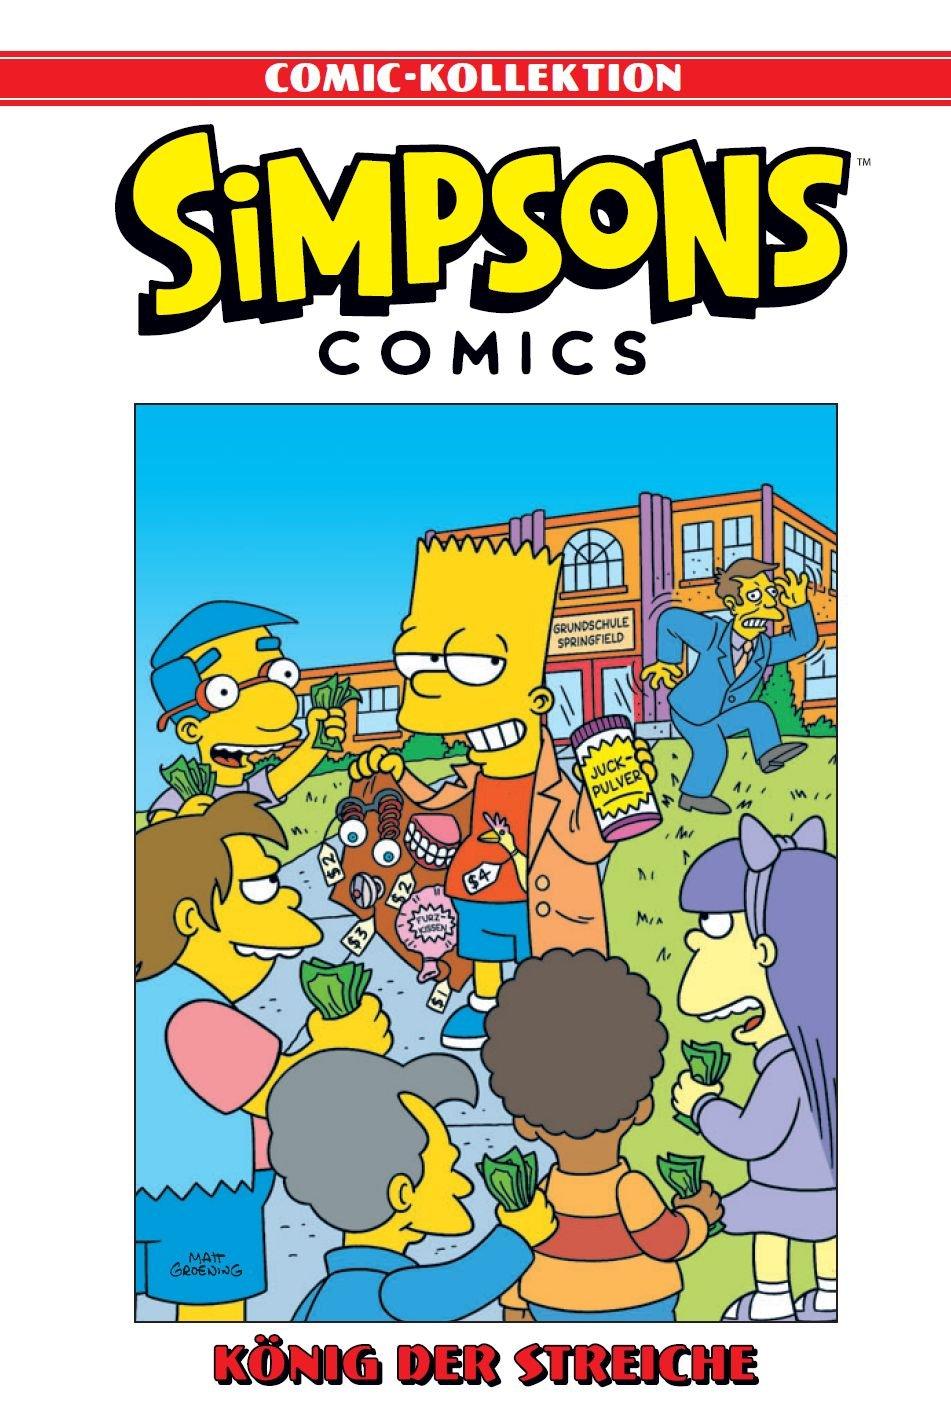 Simpsons Comic-Kollektion: Bd. 7: König der Streiche Gebundenes Buch – 25. Juni 2018 Matt Groening Gerald Andre Martin Schlömer Matthias Wieland